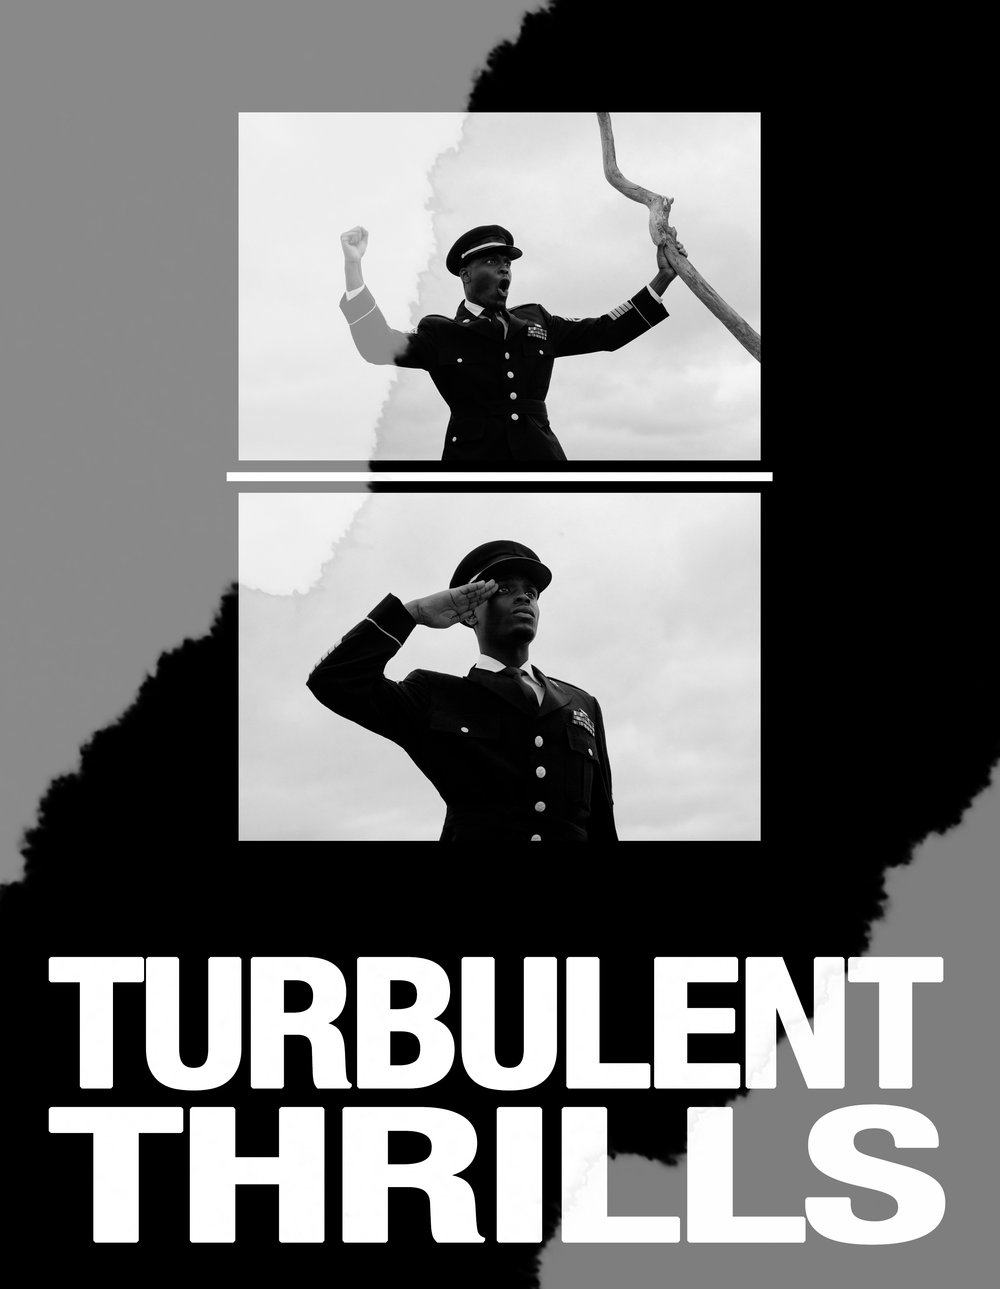 turbulentthrills.jpg